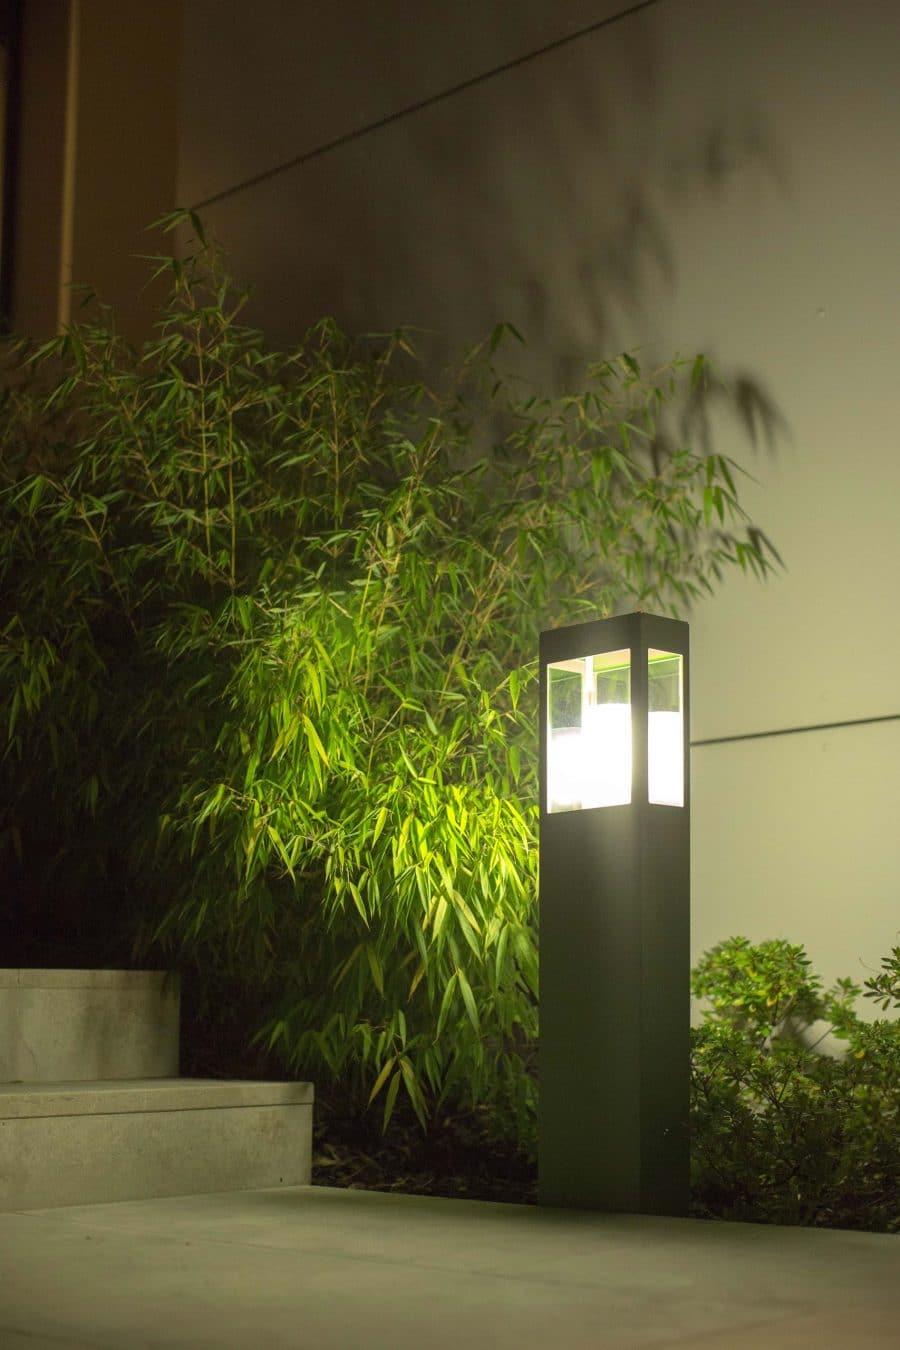 Brick tuinverlichting roger pradier buitenlamp tuinextra kaatsheuvel